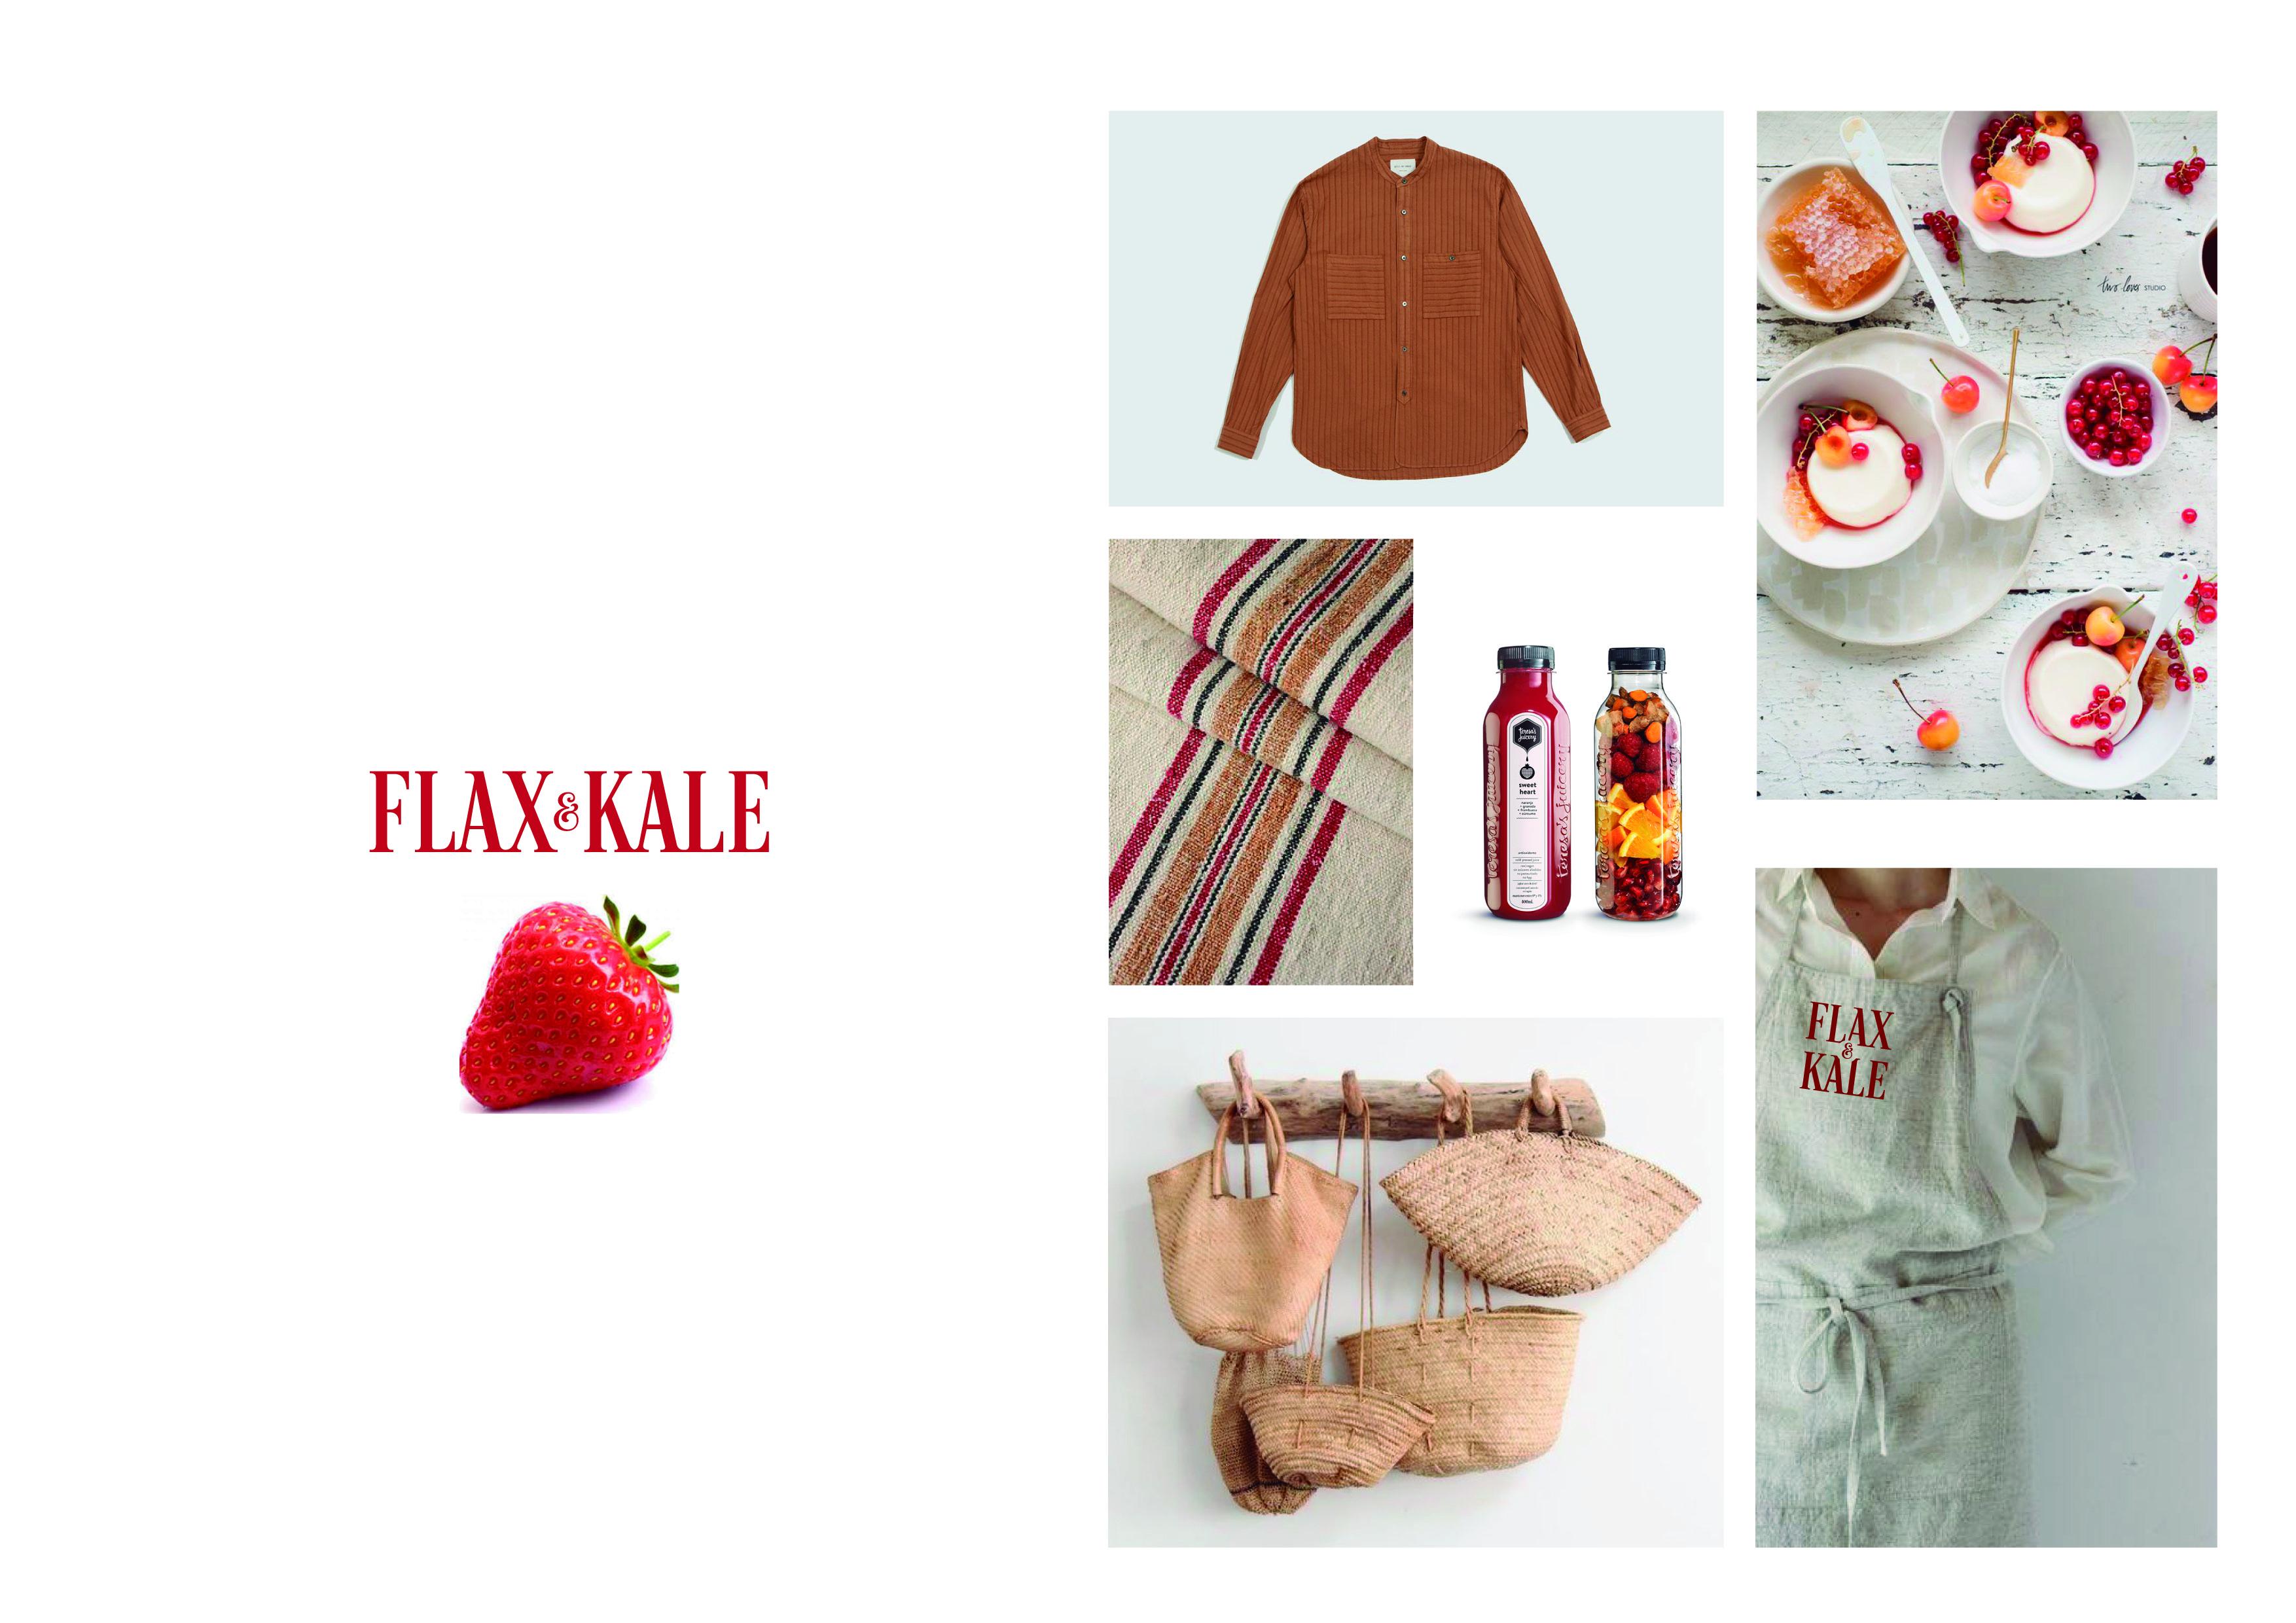 FLAX&KALE FINAL-04